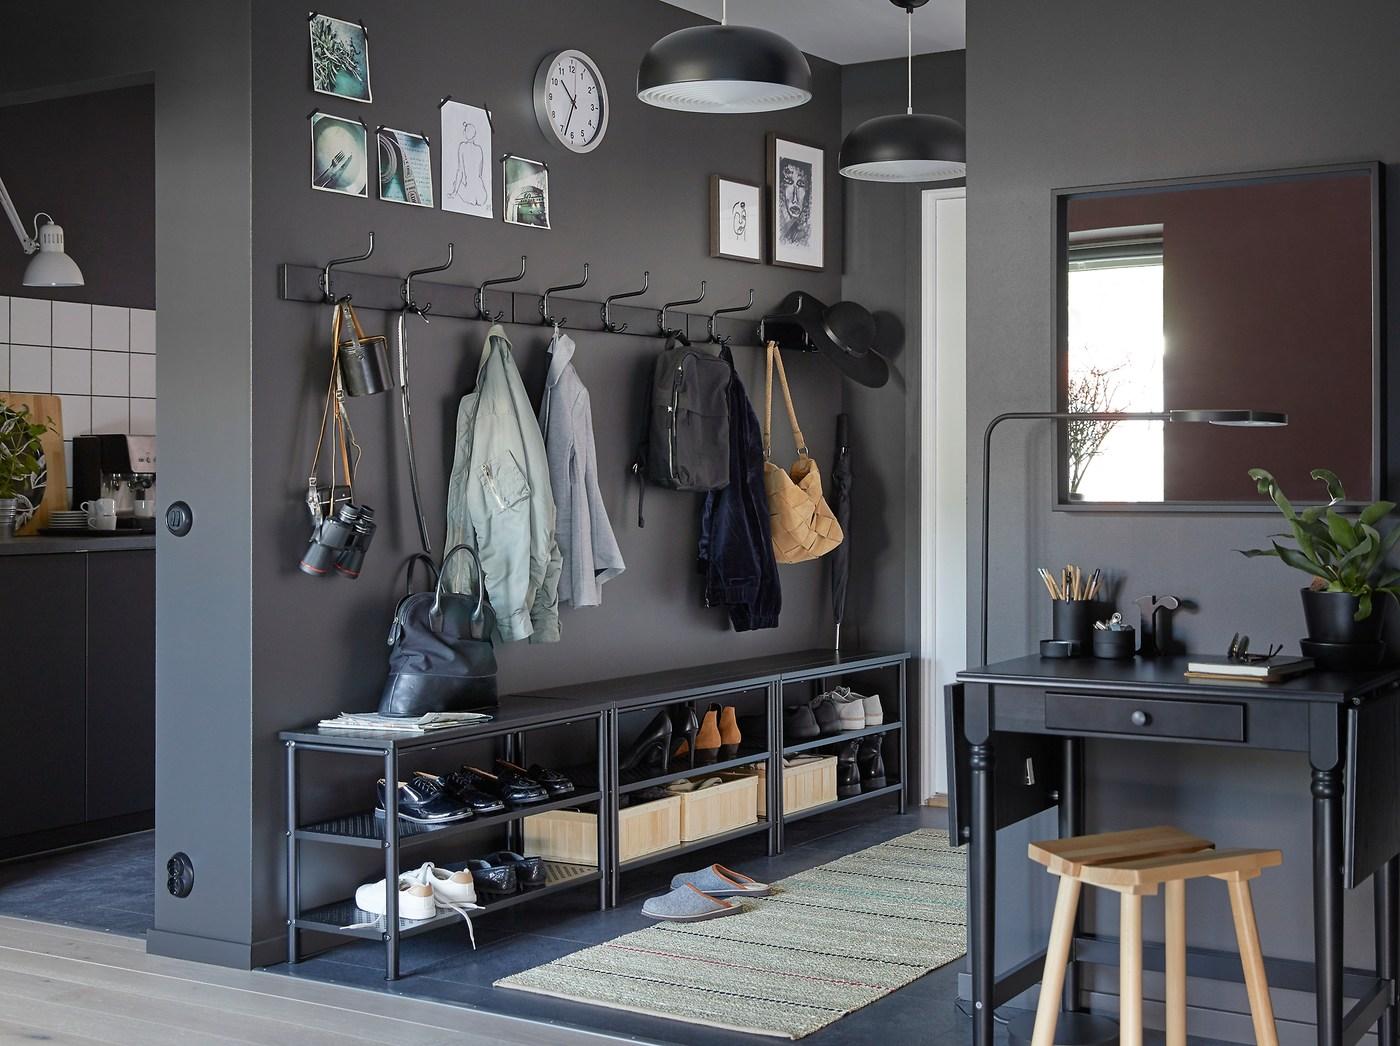 Three black PINNIG bench shoe racks and three PINNIG racks with three hooks creating storage in a narrow hallway.